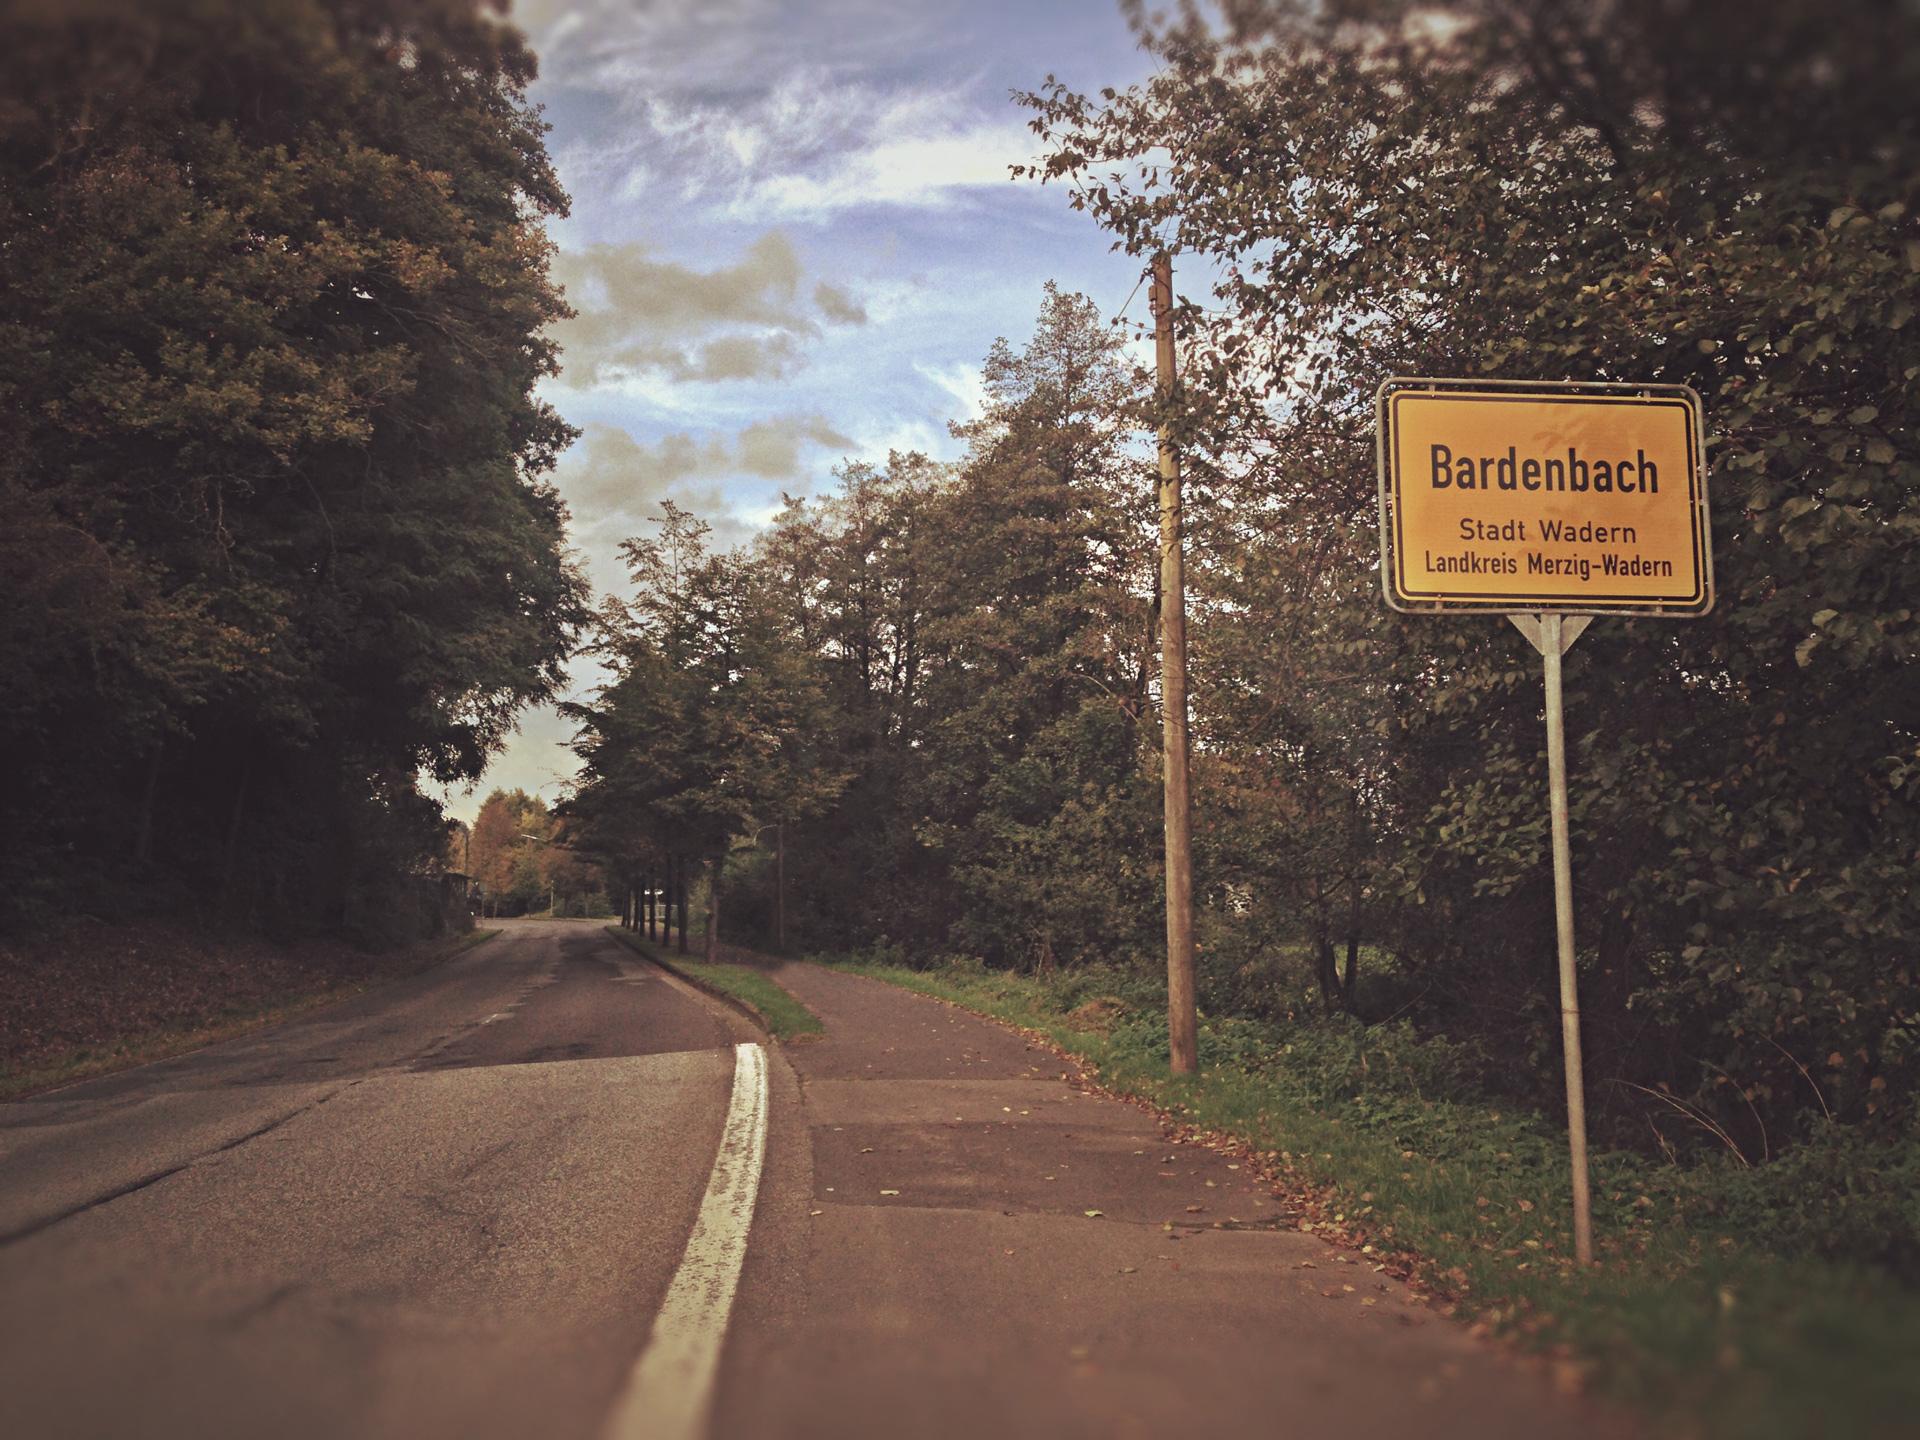 bardenbach